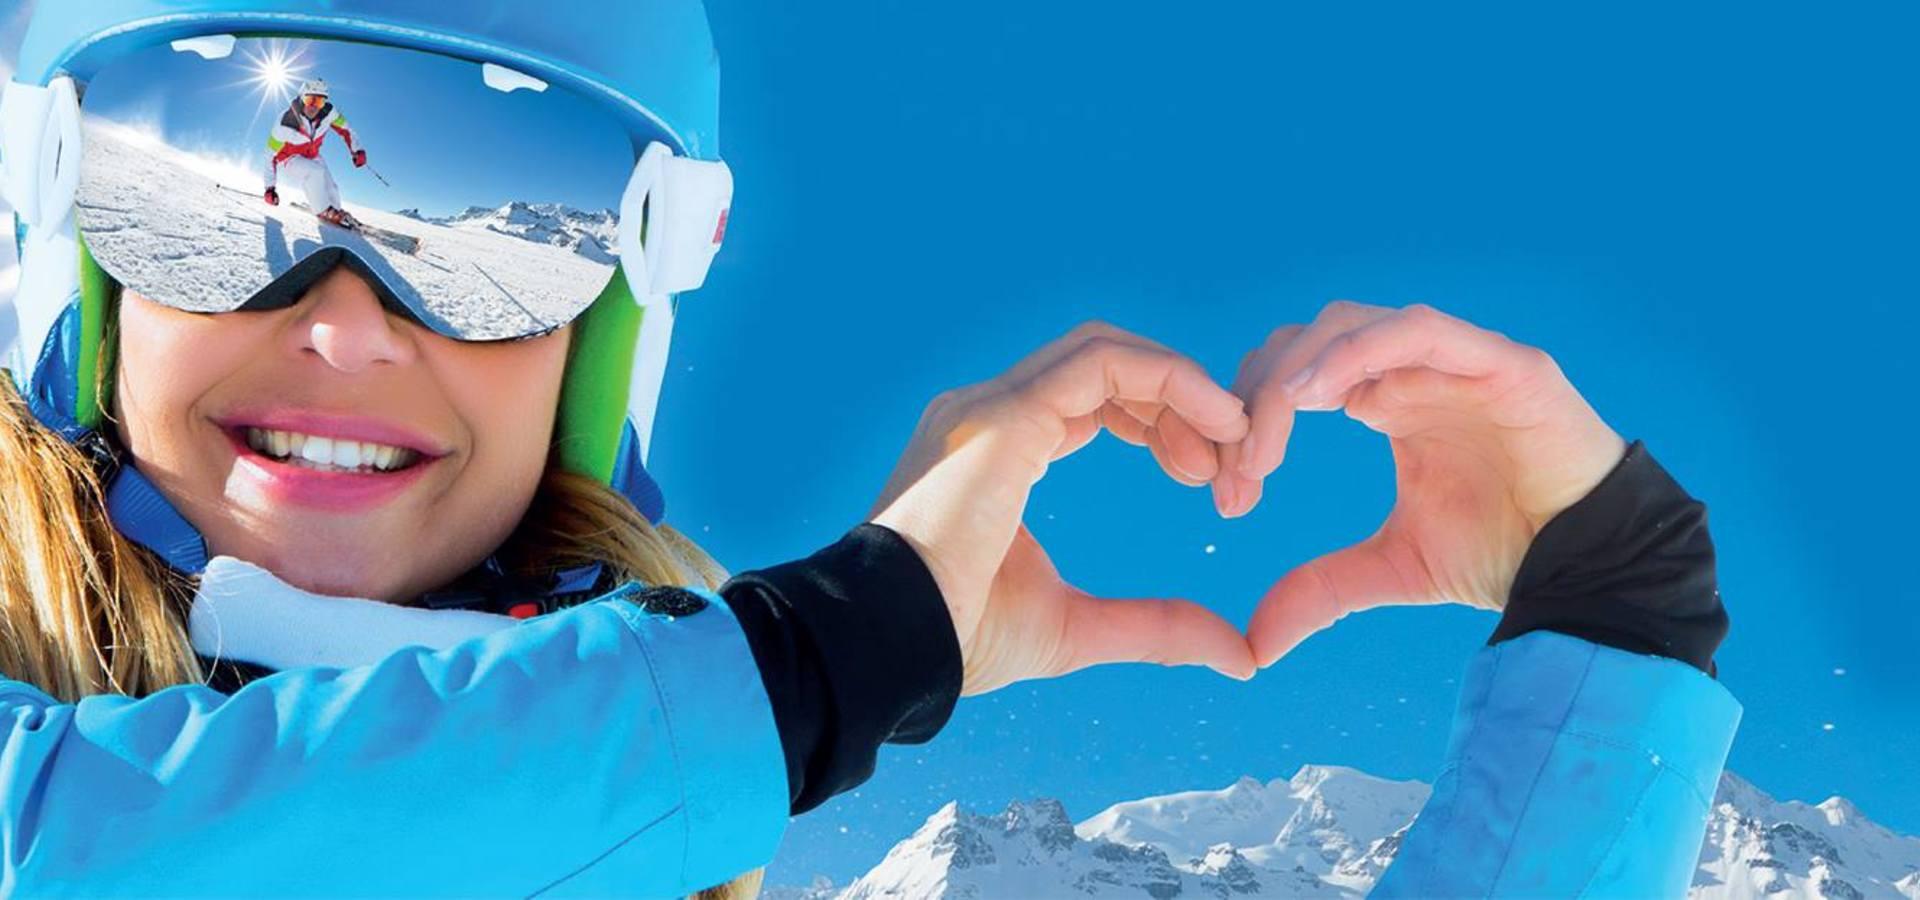 - 30 days at the End of the Winter Season Arabba-Marmolada